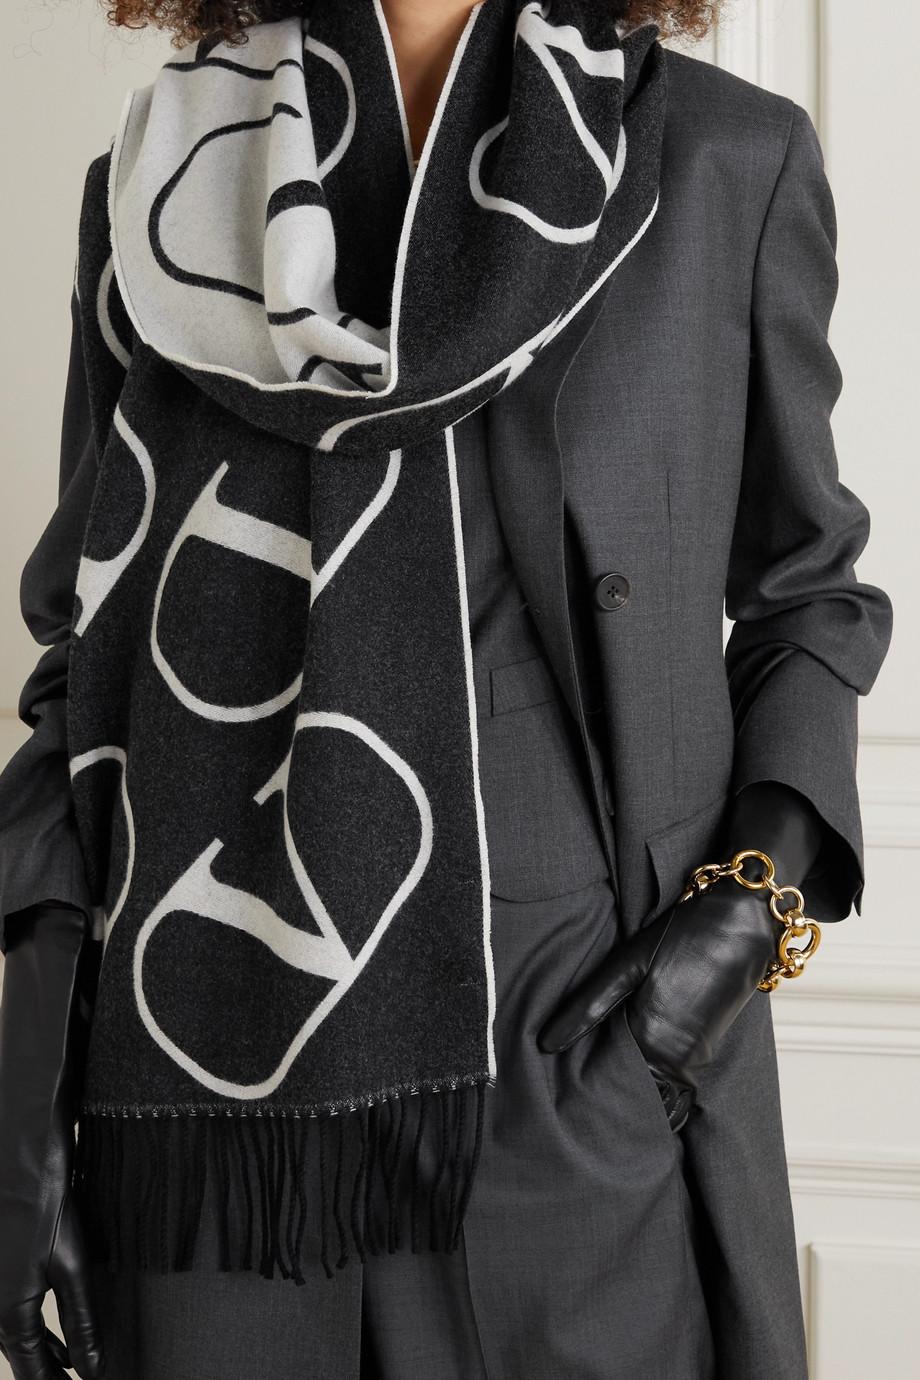 Valentino Valentino Garavani fringed intarsia wool and cashmere-blend scarf